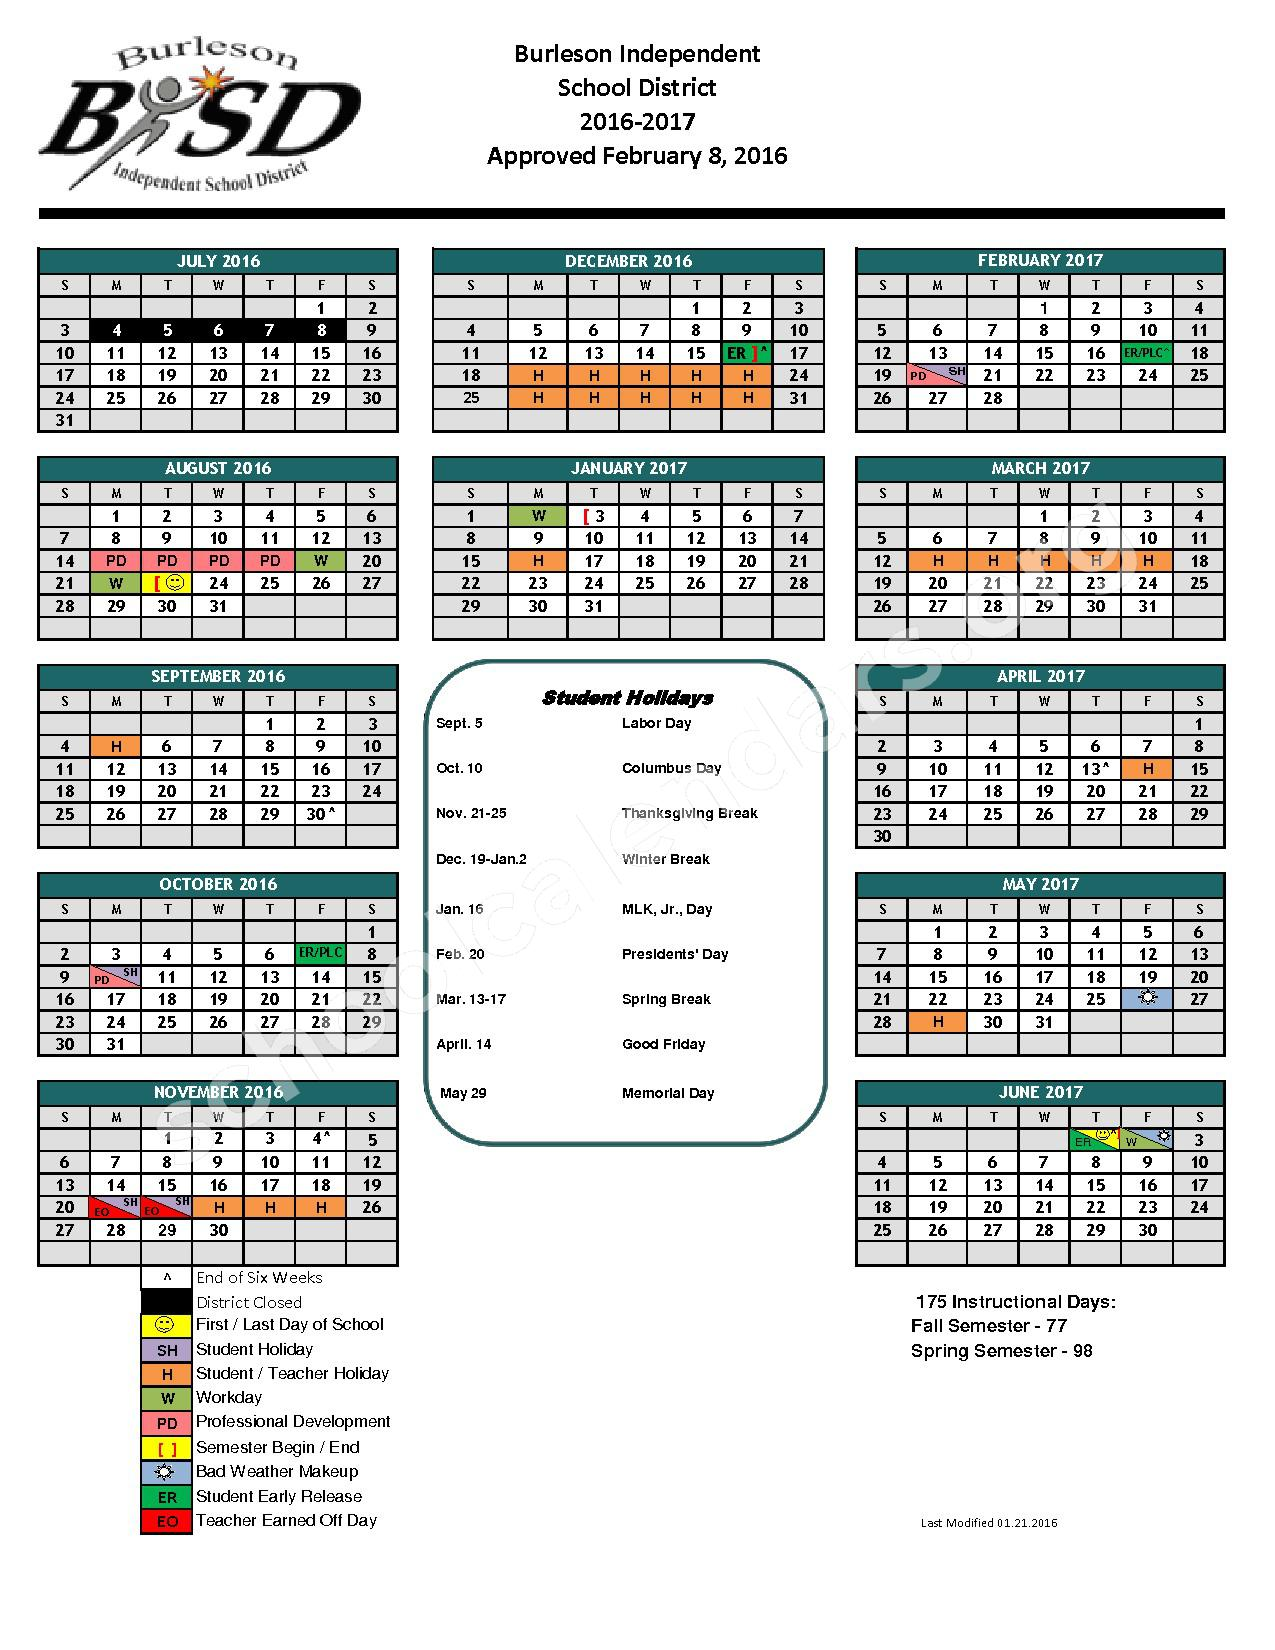 2016 - 2017 District Calendar – Frazier Elementary School – page 1